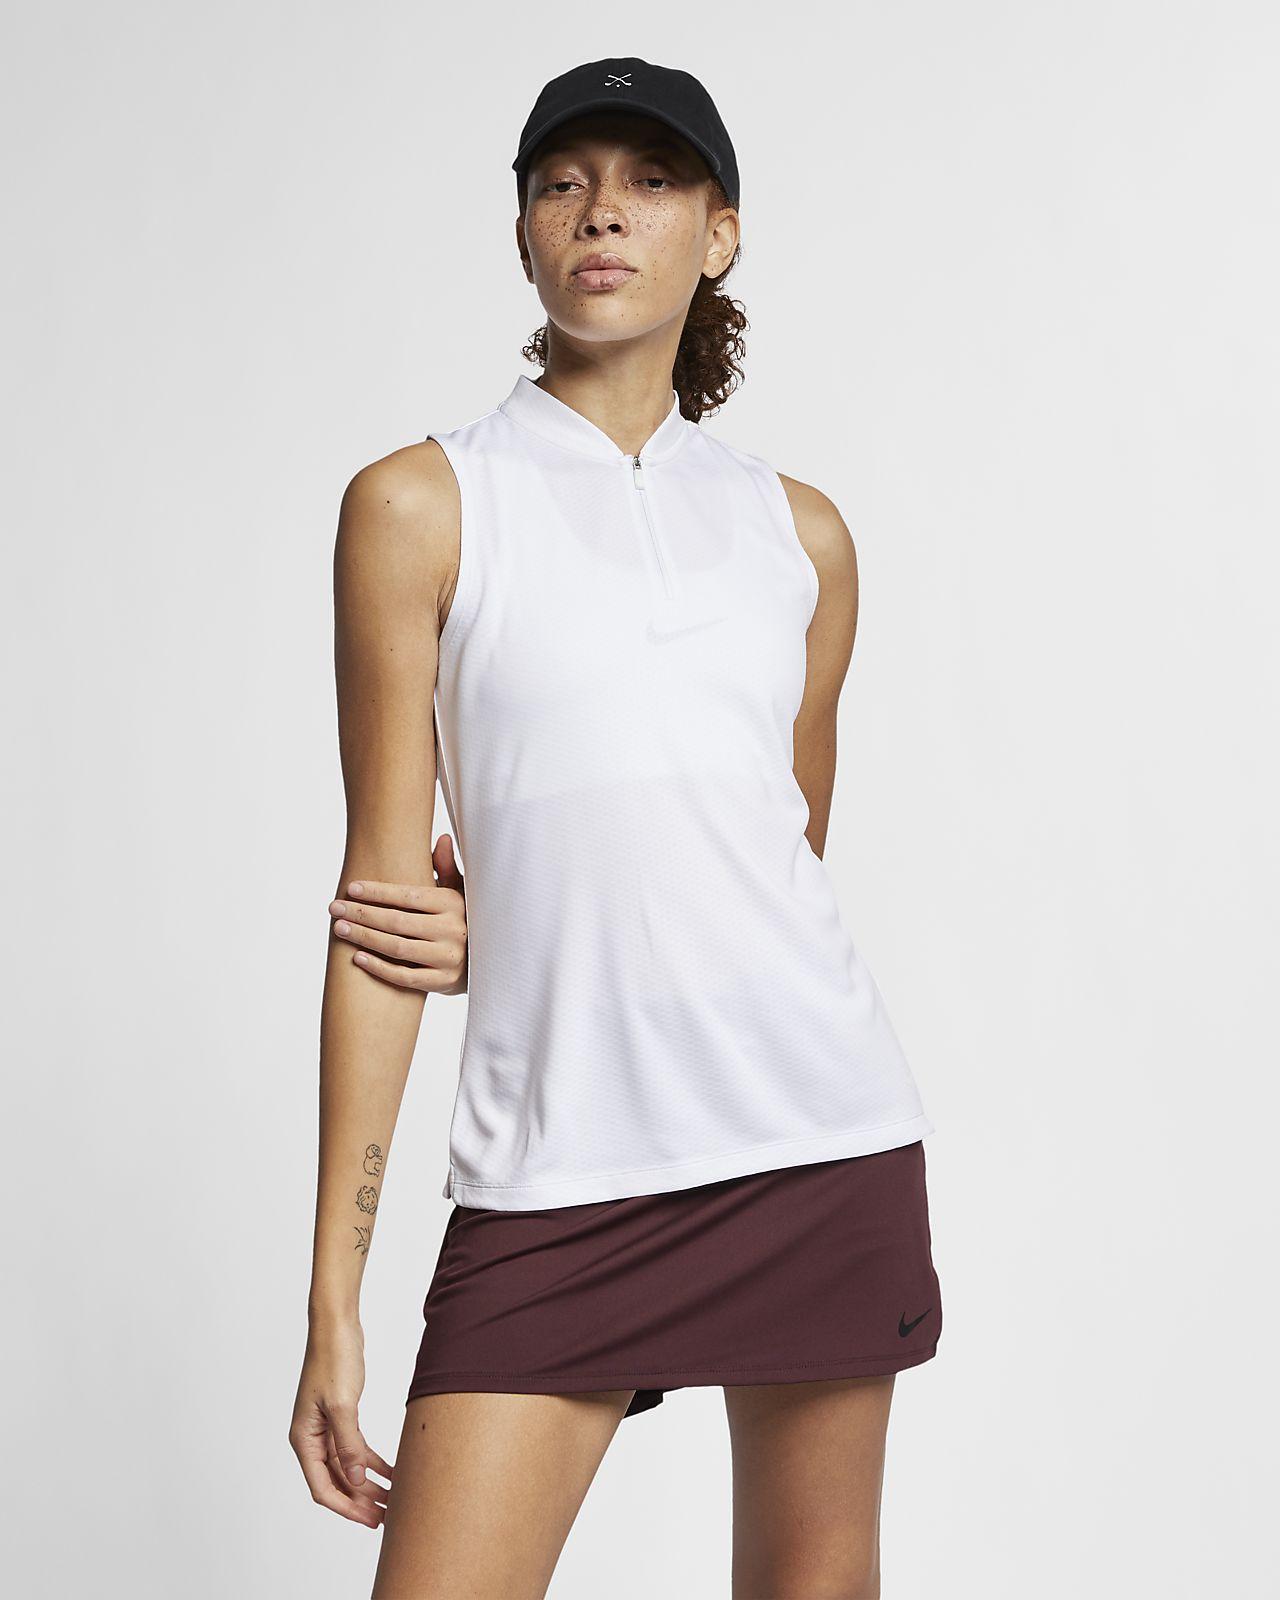 fae28e01 Nike Dri-FIT Women's Sleeveless Golf Polo. Nike.com